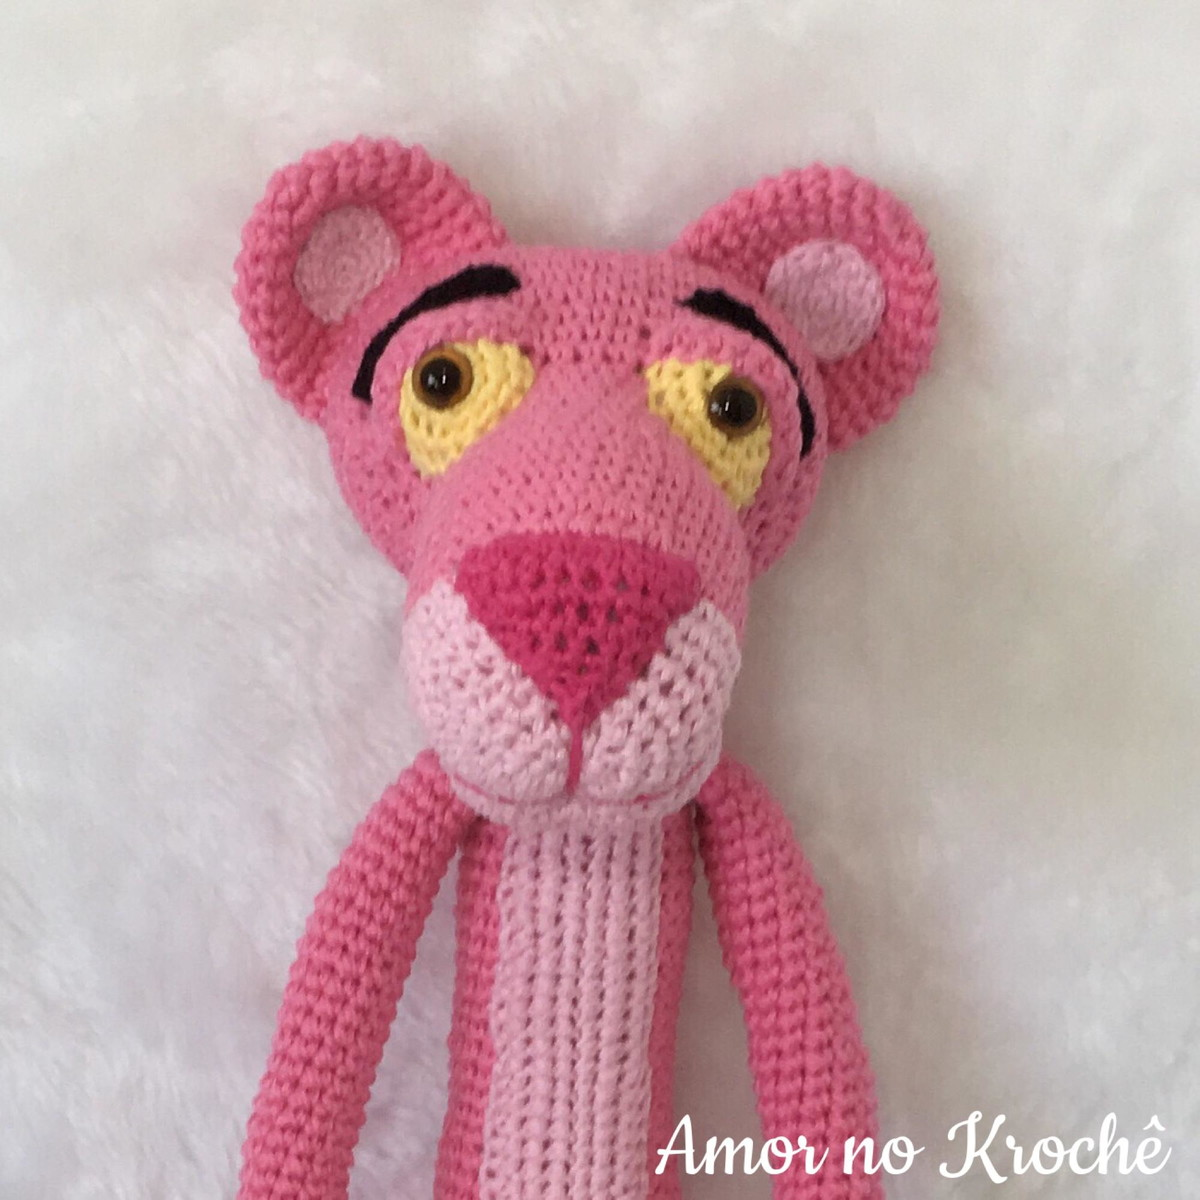 Boneca de crochê: +40 ideias com amigurumi fantásticas ...   1200x1200